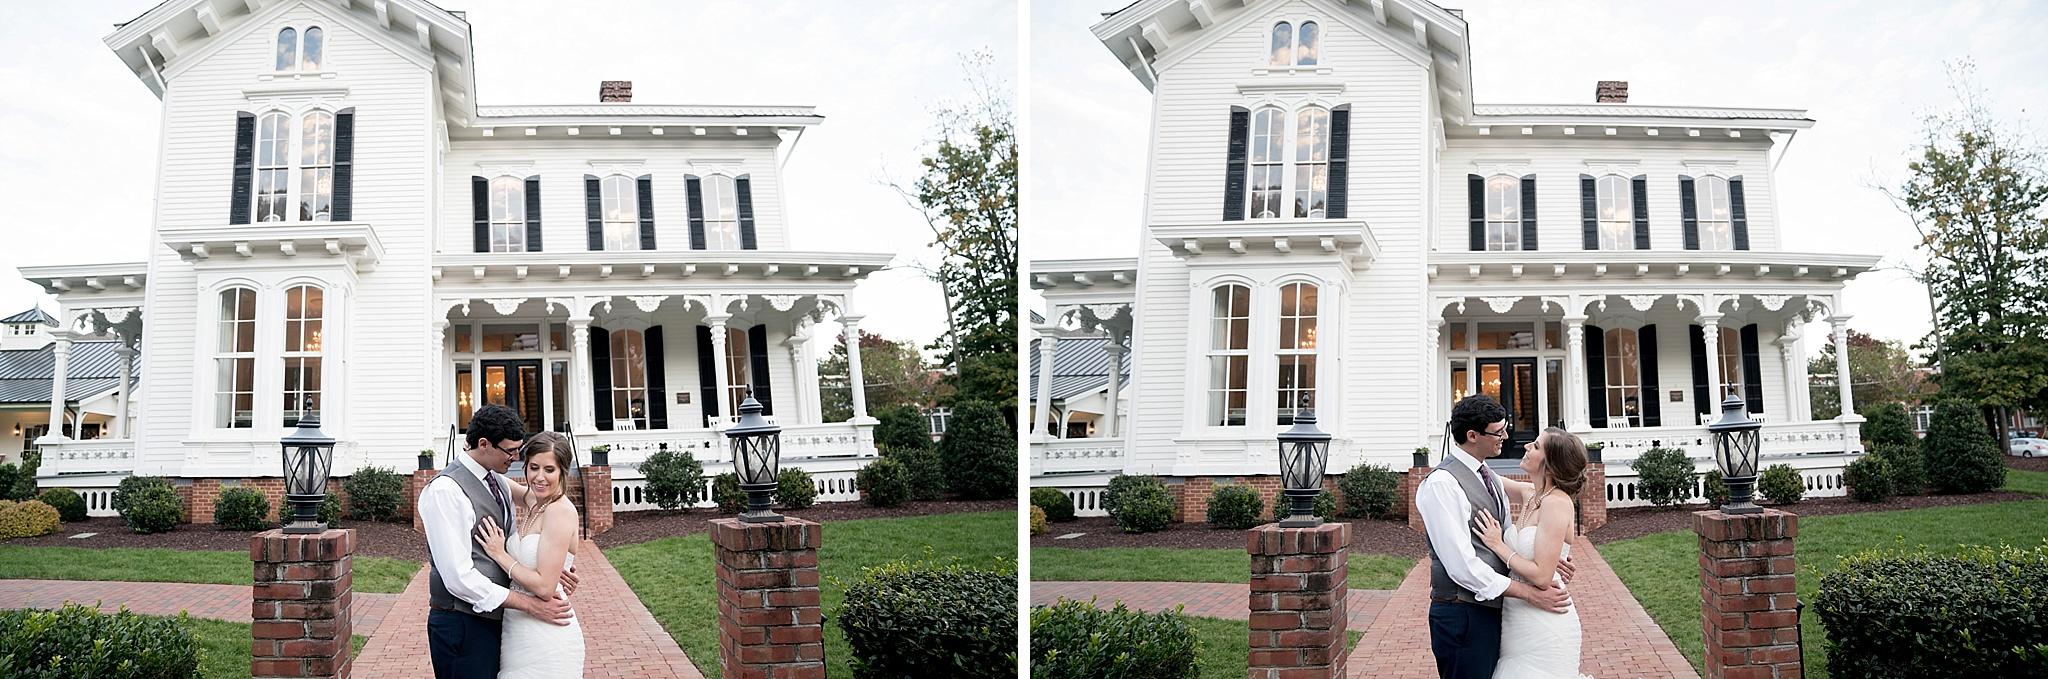 Merrimon-Wynne-House-Photographer-170.jpg